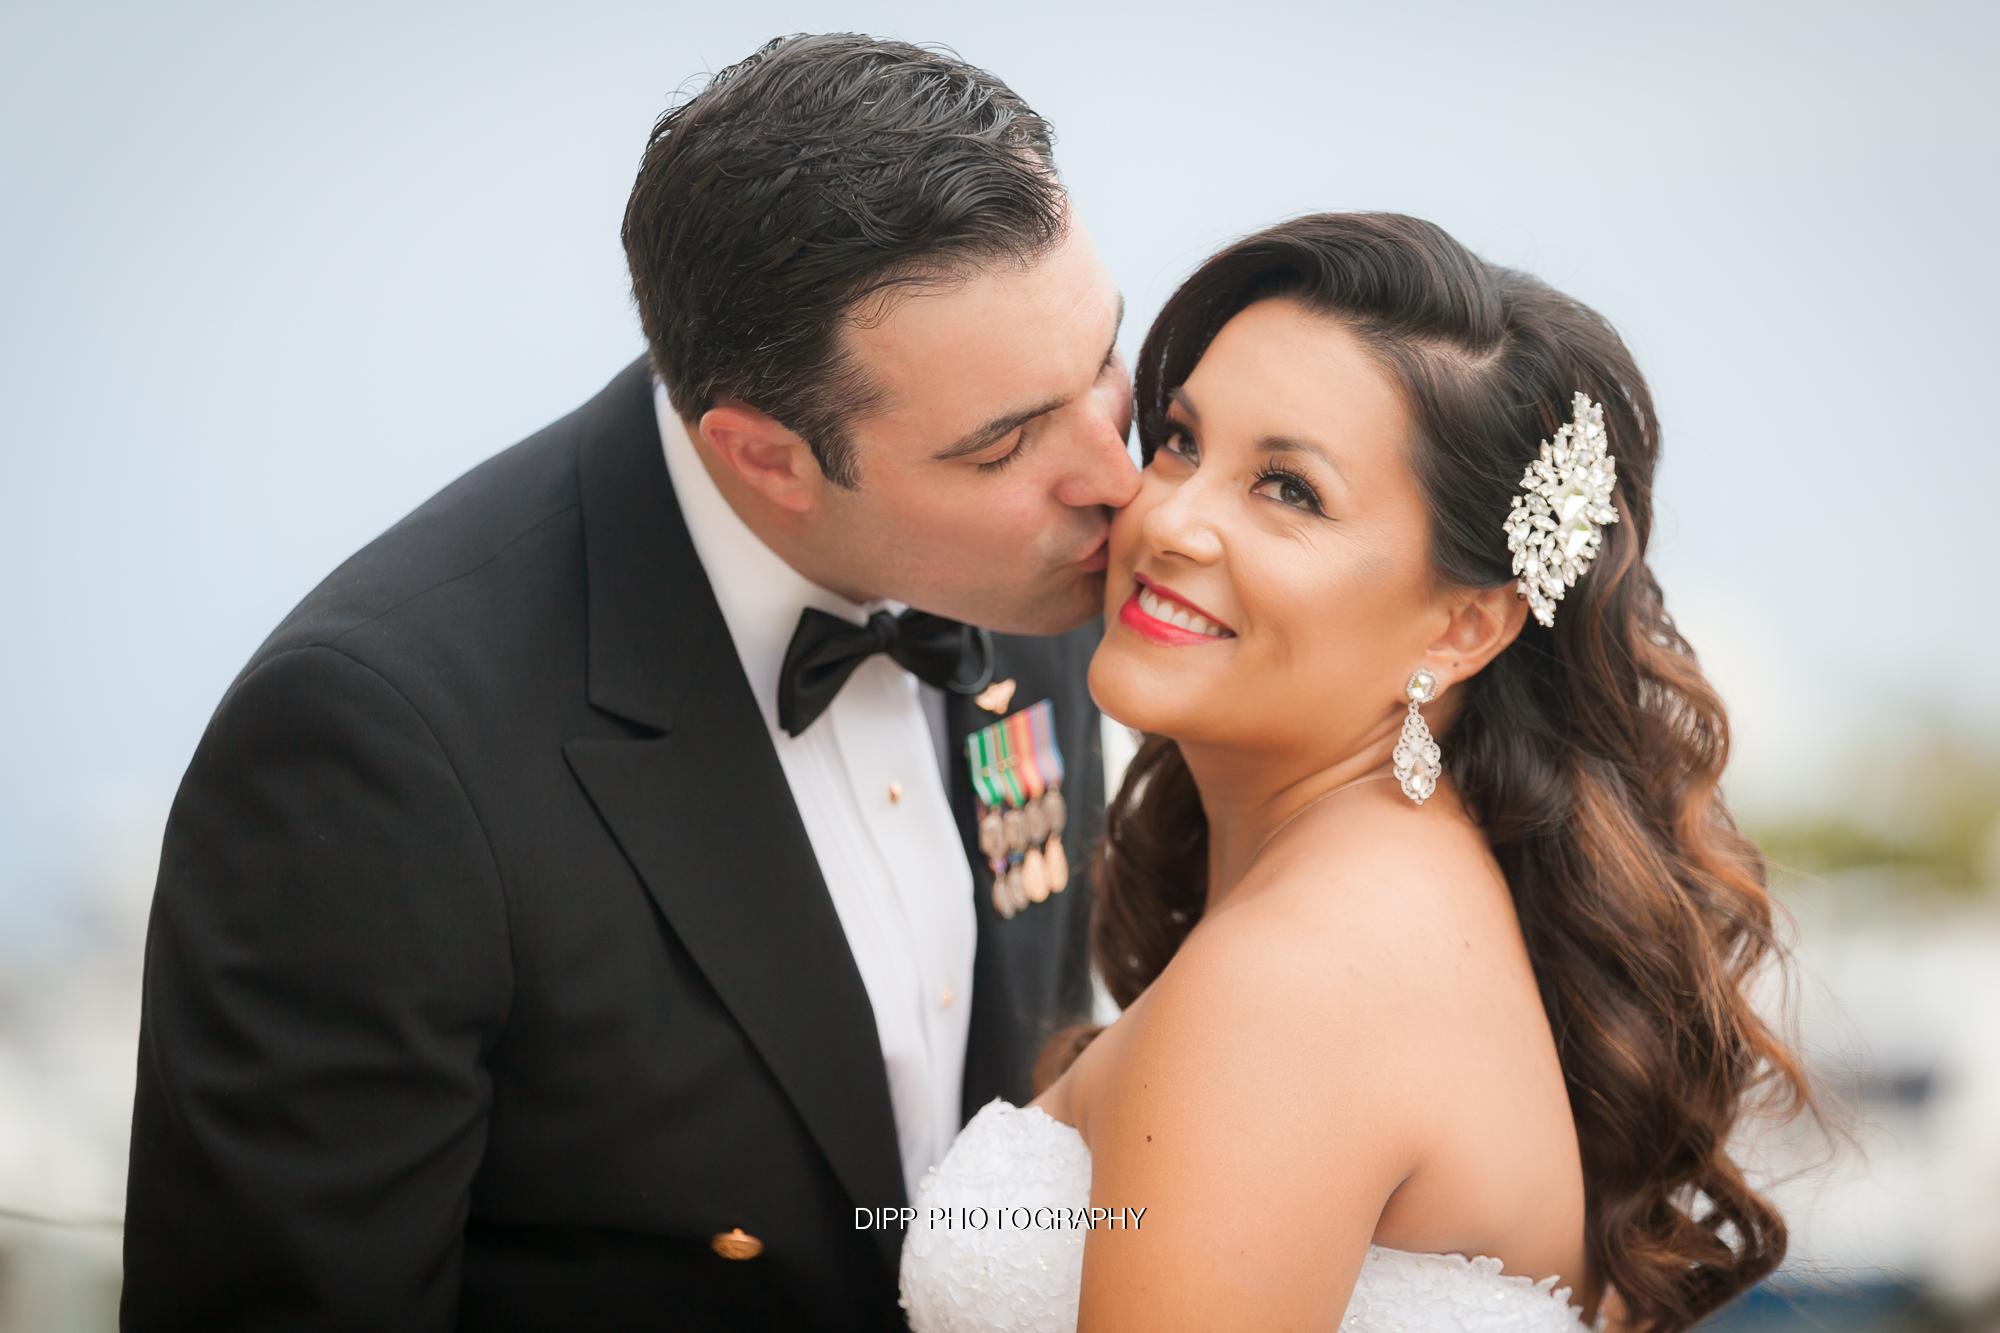 Dipp_2016 EDITED Sara & Brandon Wedding-82